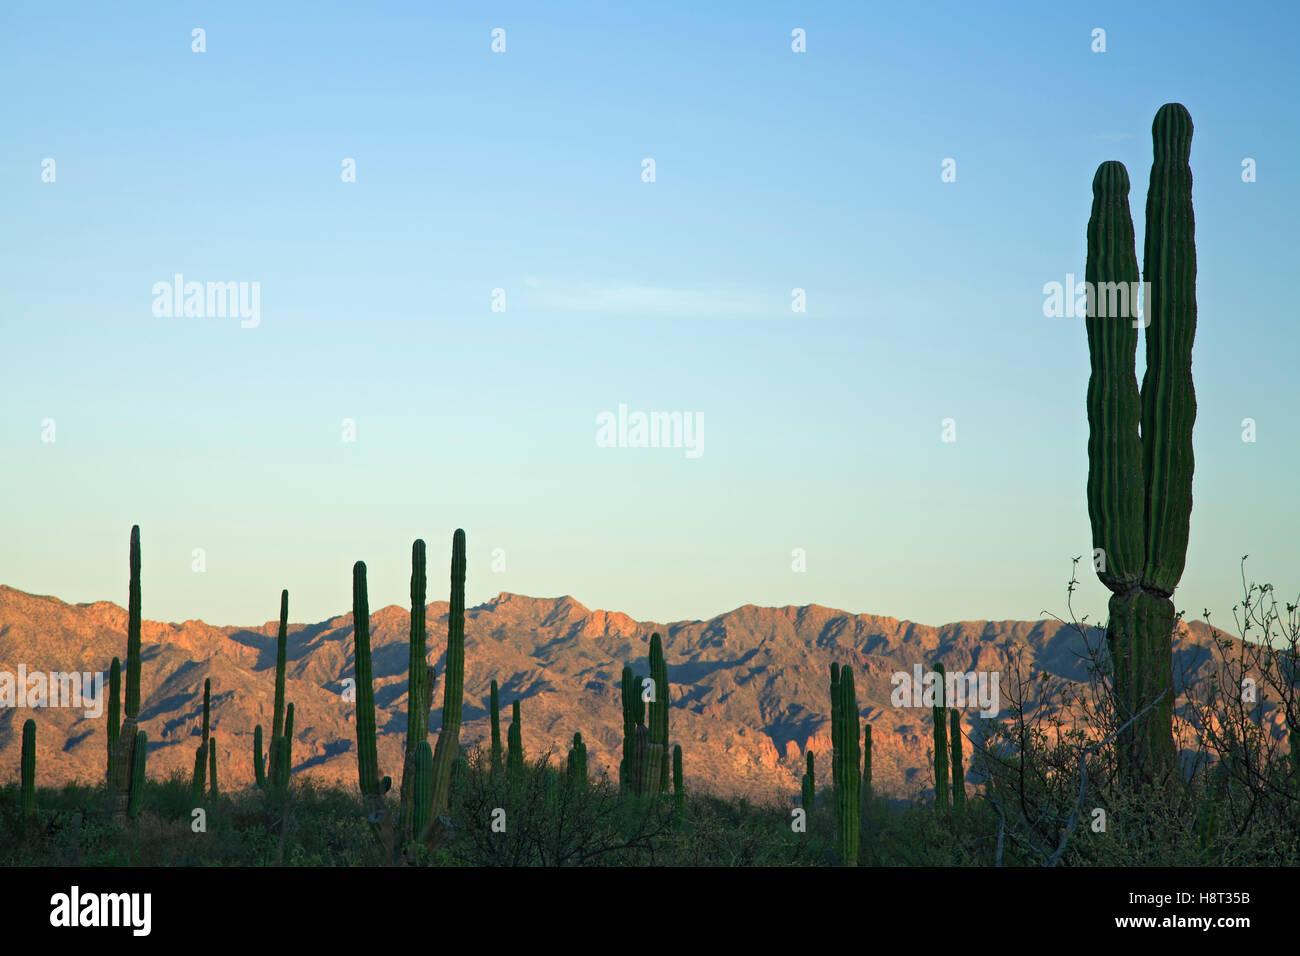 Silhouette of cardon (Pachycereus) trees and mountains, near Mulege, Baja California Sur, Mexico - Stock Image